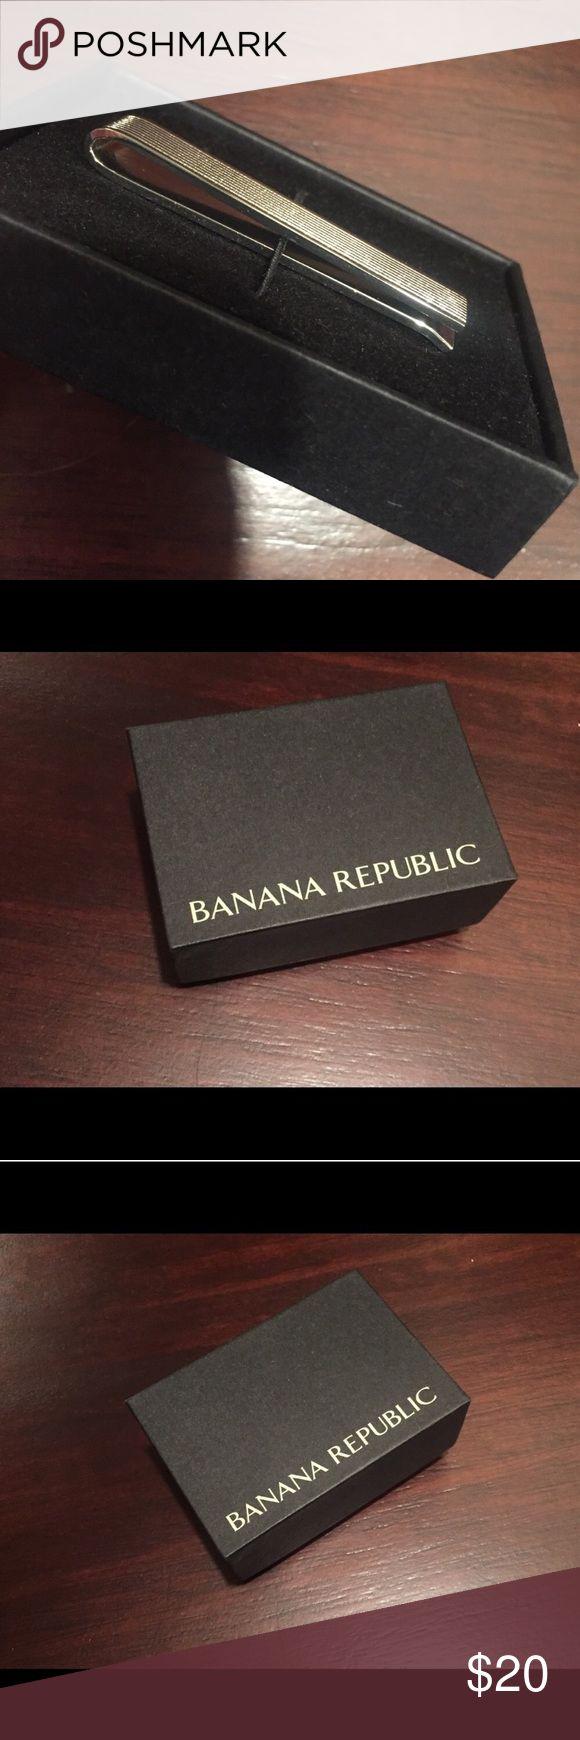 ☀️NWT Banana Republic Men's Silver Money Clip OS Banana Republic Men's Silver Money Clip, Brand New in Box, One Size Banana Republic Accessories Money Clips